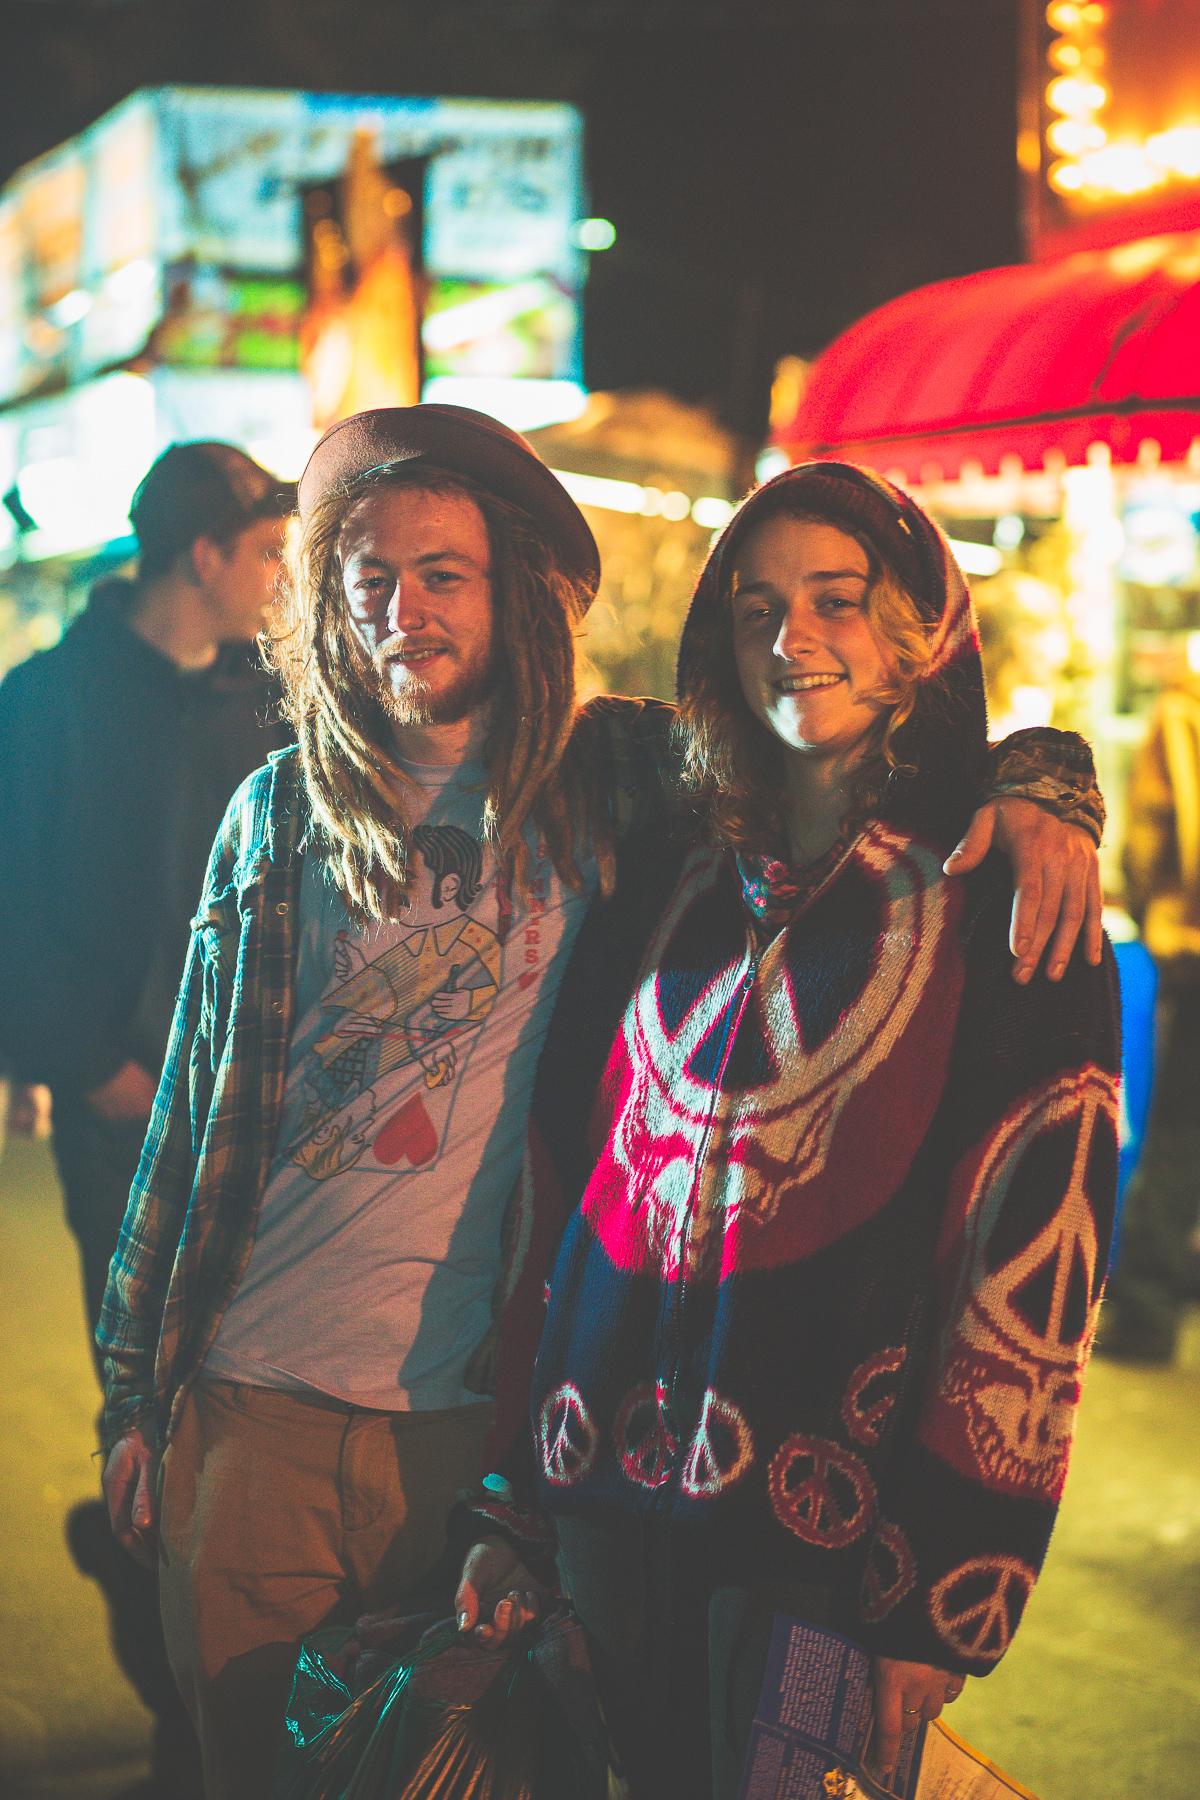 FF_Night_Portraits-1.jpg